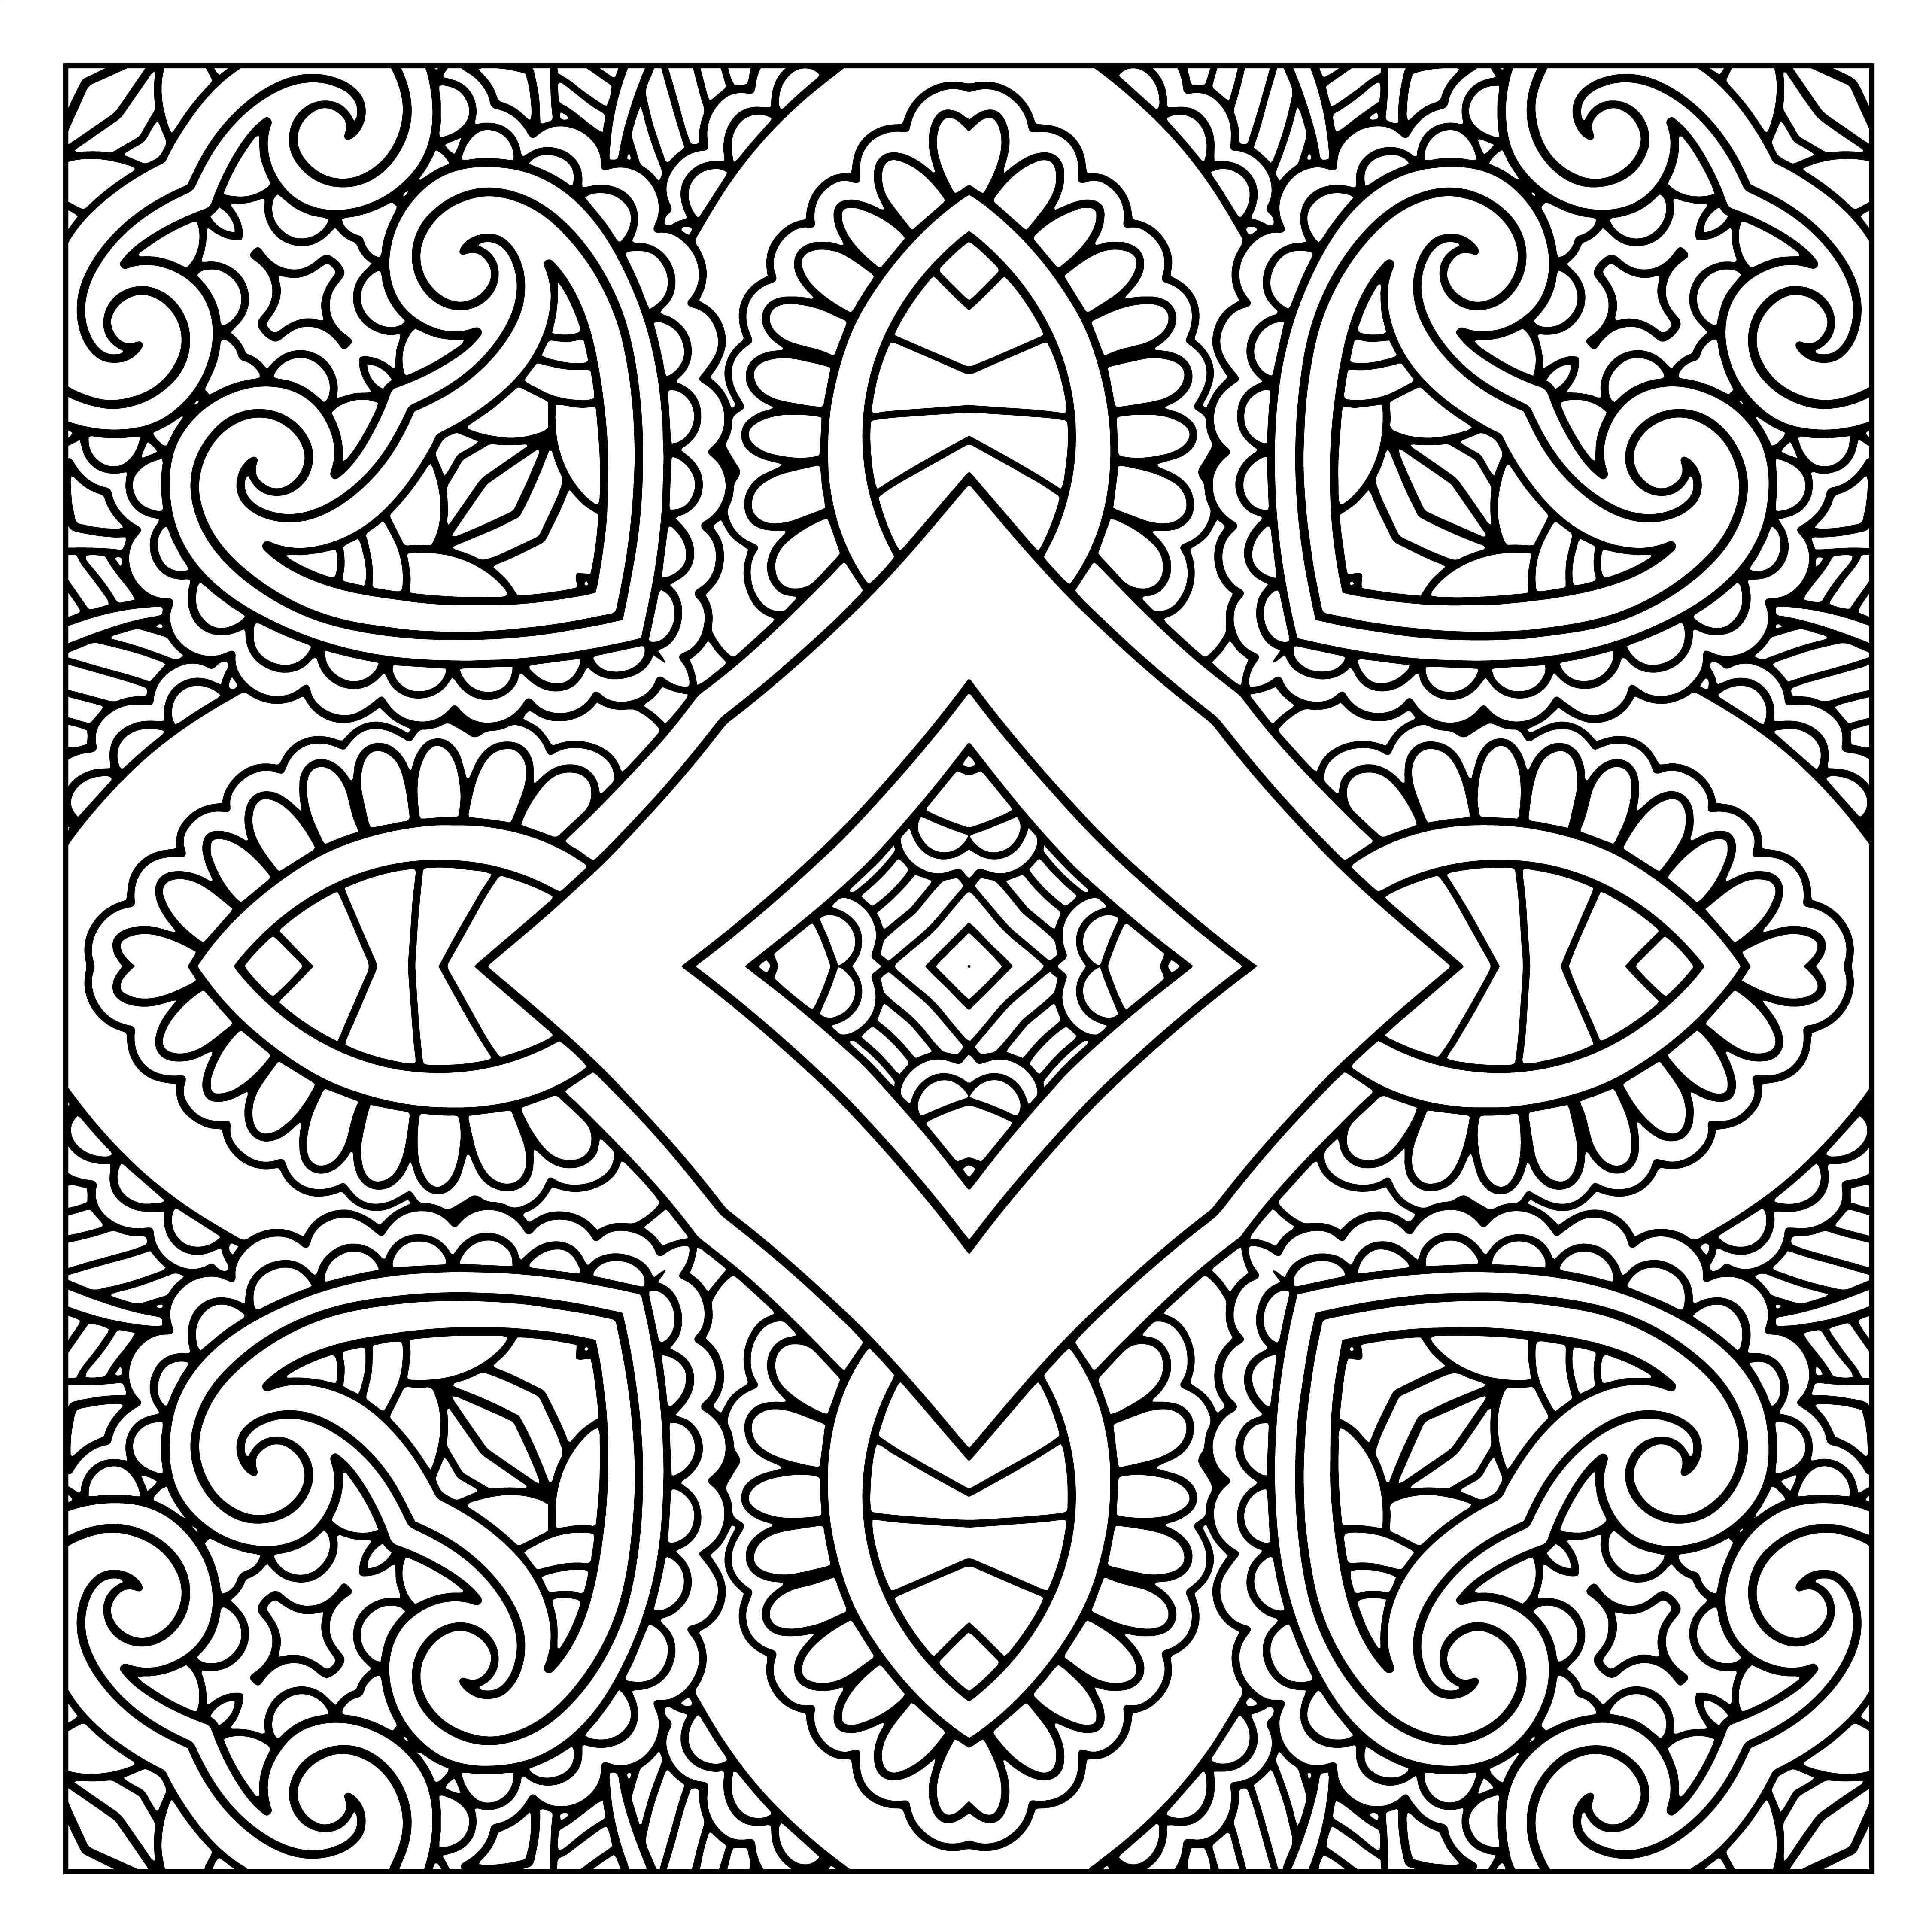 50 Free Square Patterns Kaleidoscope Adult Coloring ...